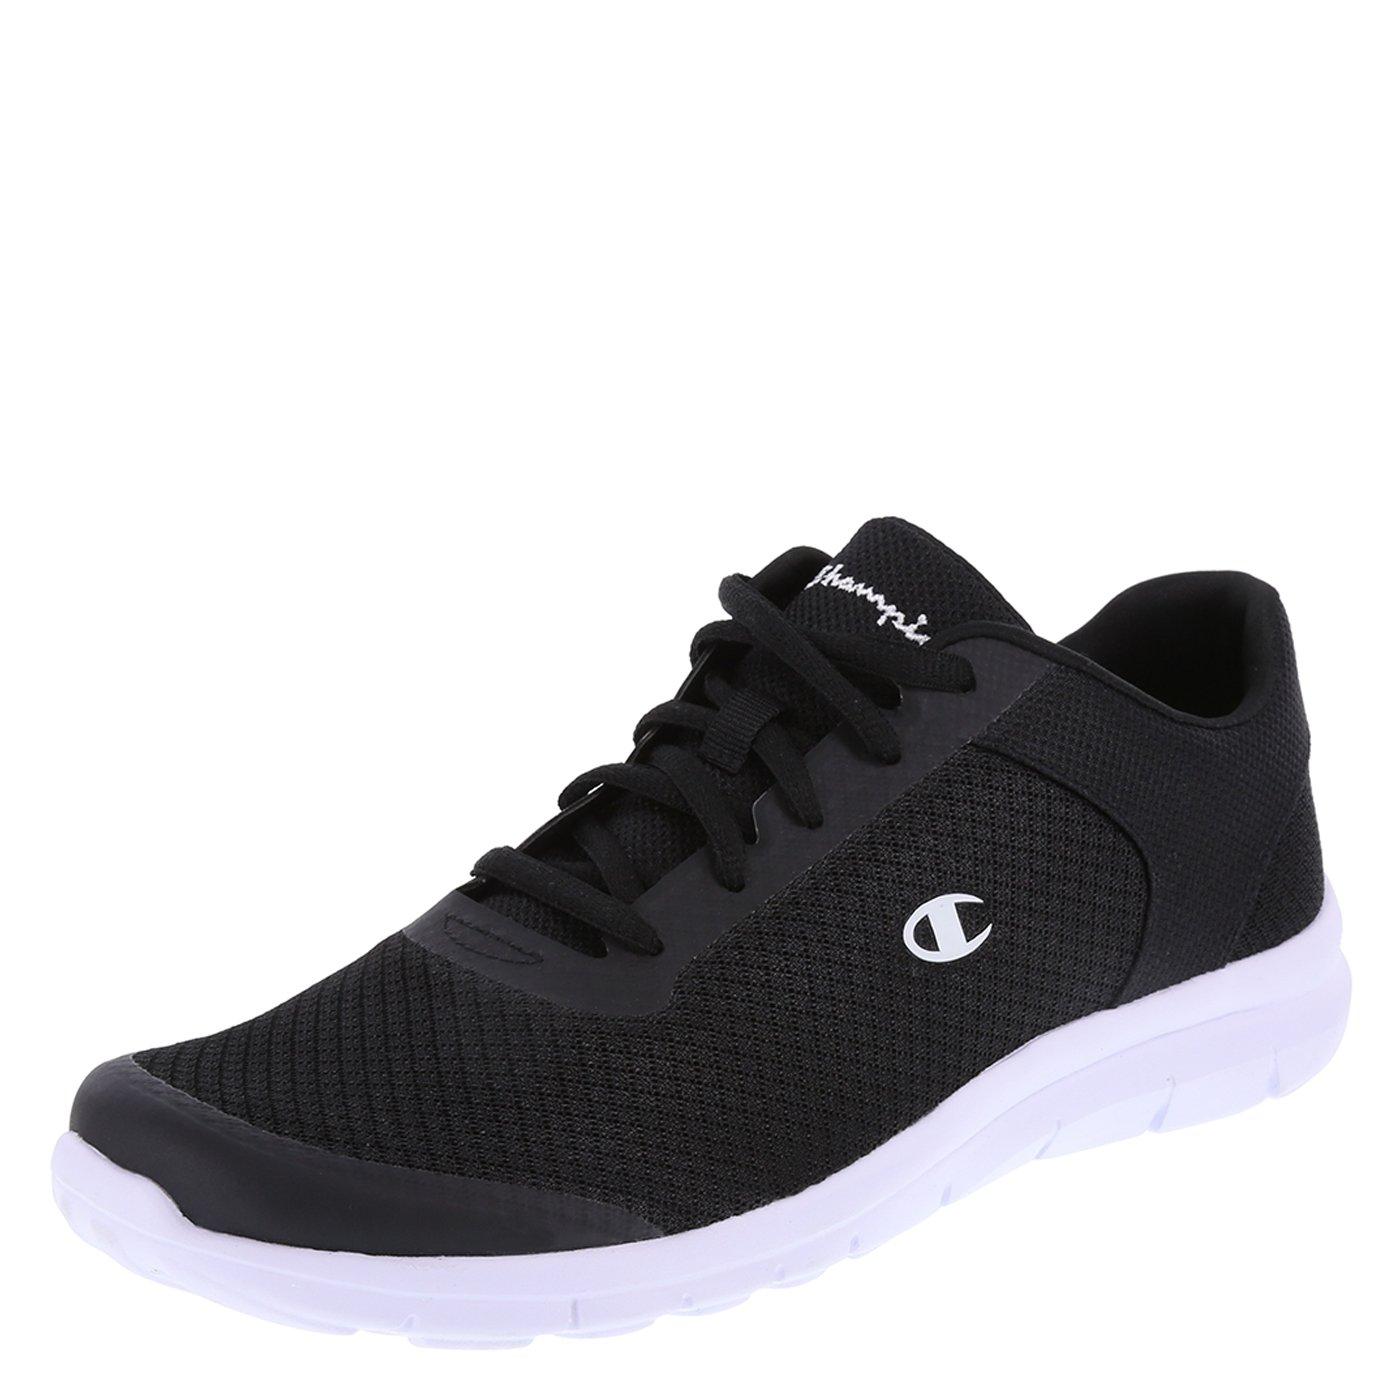 ebbf11bbfd875f Champion mens gusto cross trainer running jpg 1400x1400 Champion tennis  shoes for men